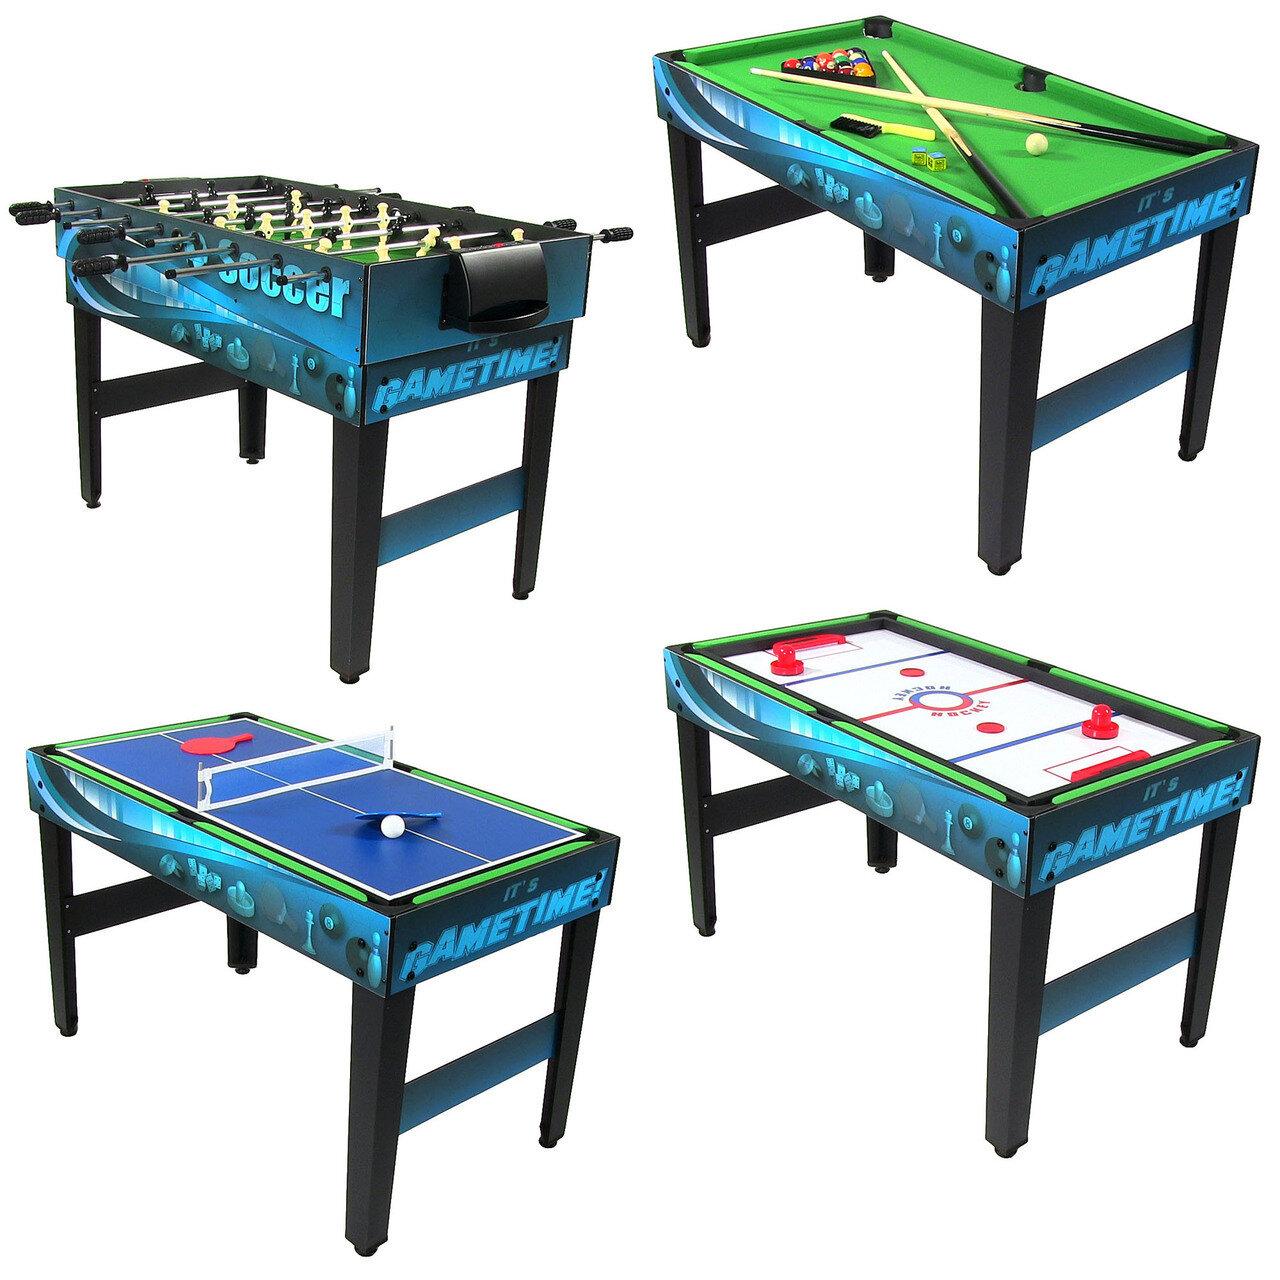 Wildon Home ® 10 In 1 Multi Game Table U0026 Reviews | Wayfair